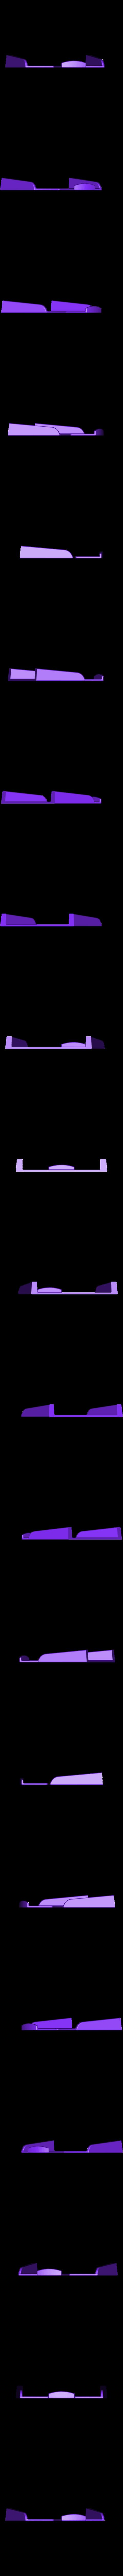 Printer_Slot_1.STL Download free STL file Table Organizer - Hand Printer • 3D print design, KuKu